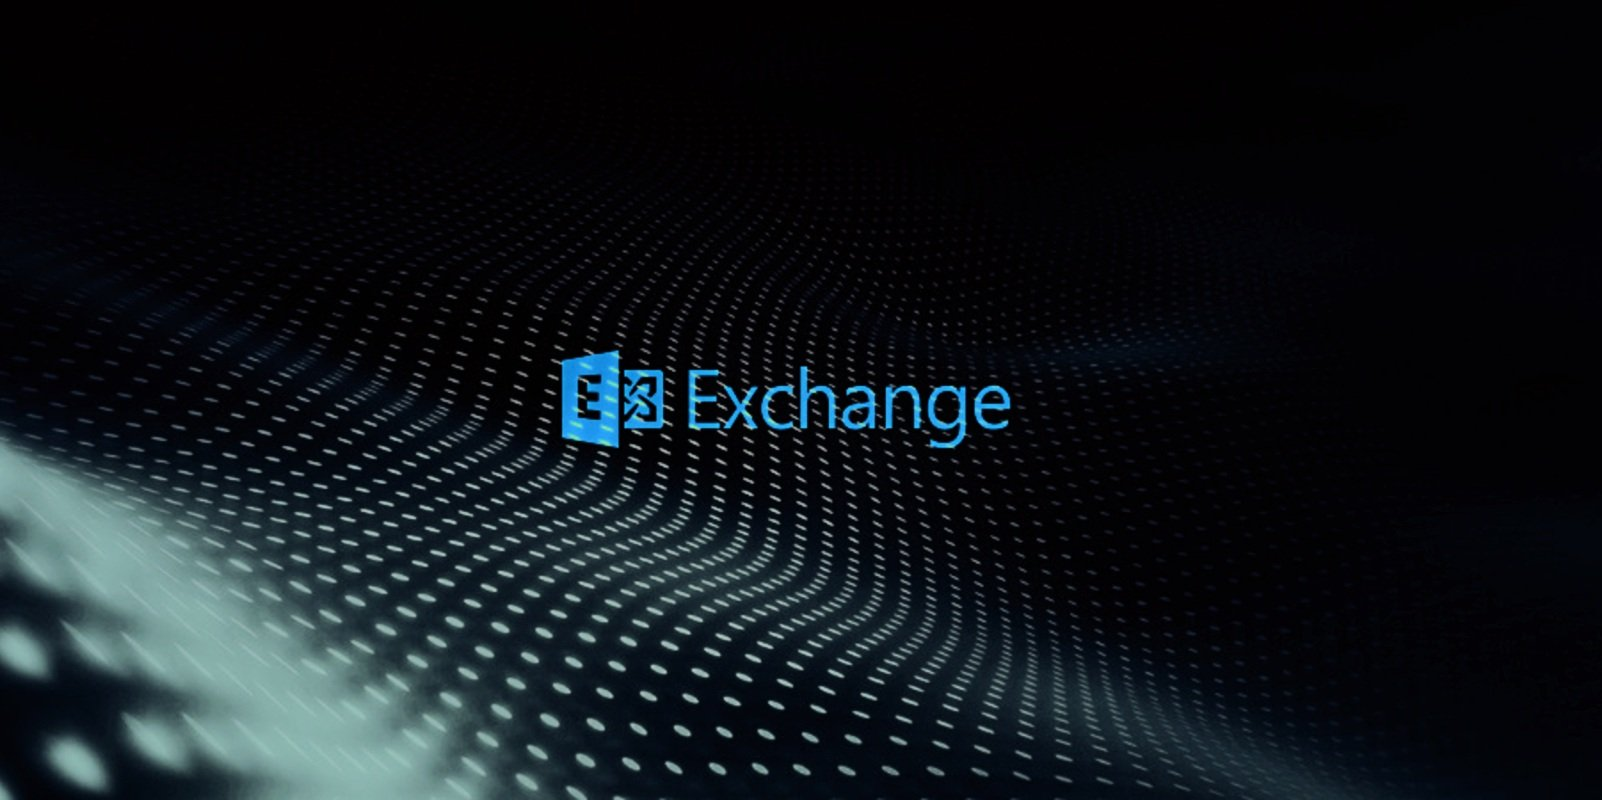 Microsoft-Exchange.jpg